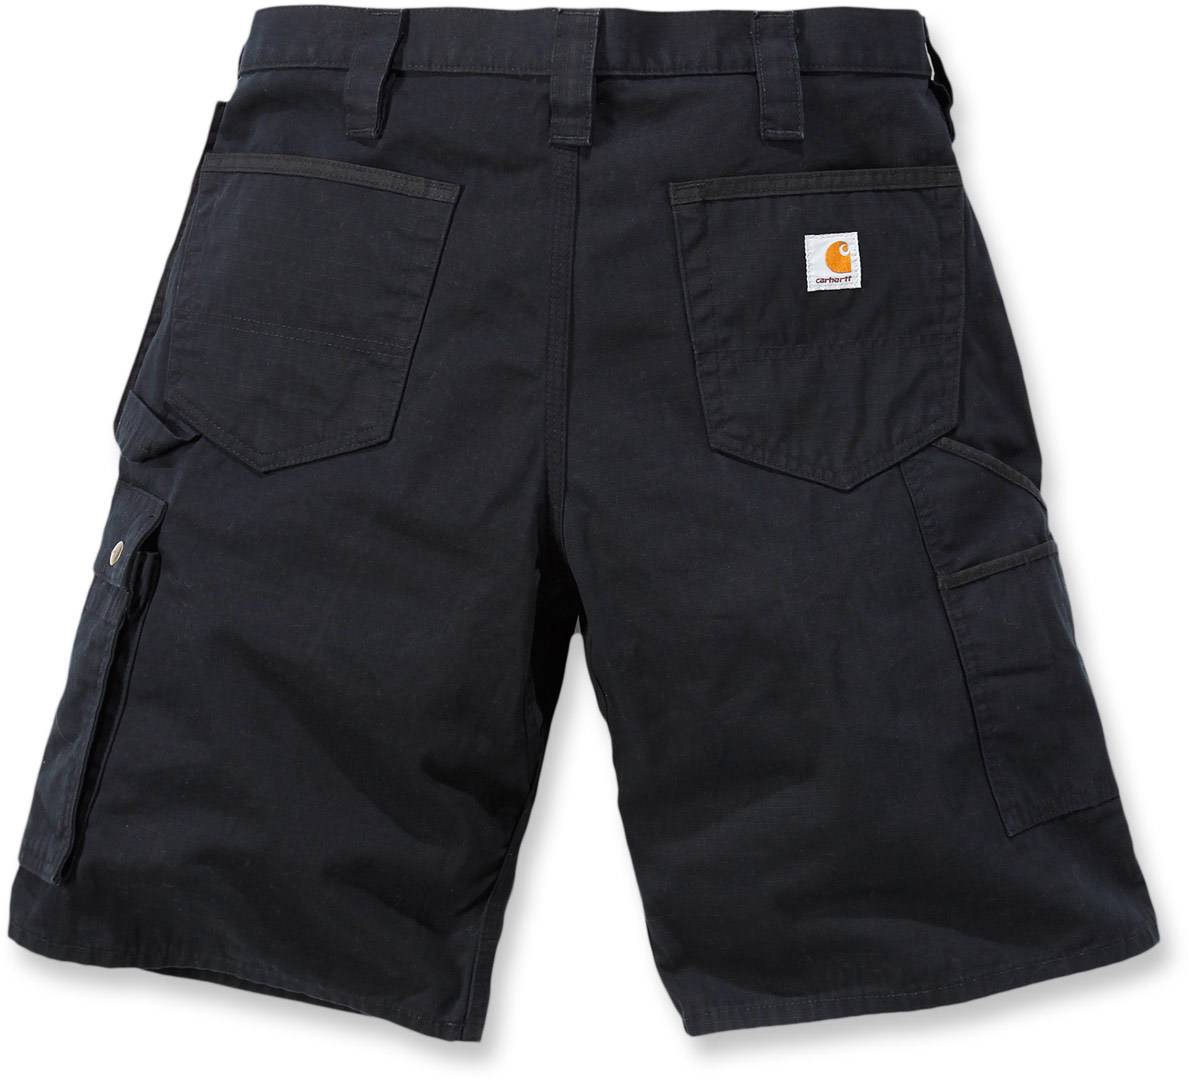 Carhartt Multi Pocket Ripstop Pantalones cortos Negro 32